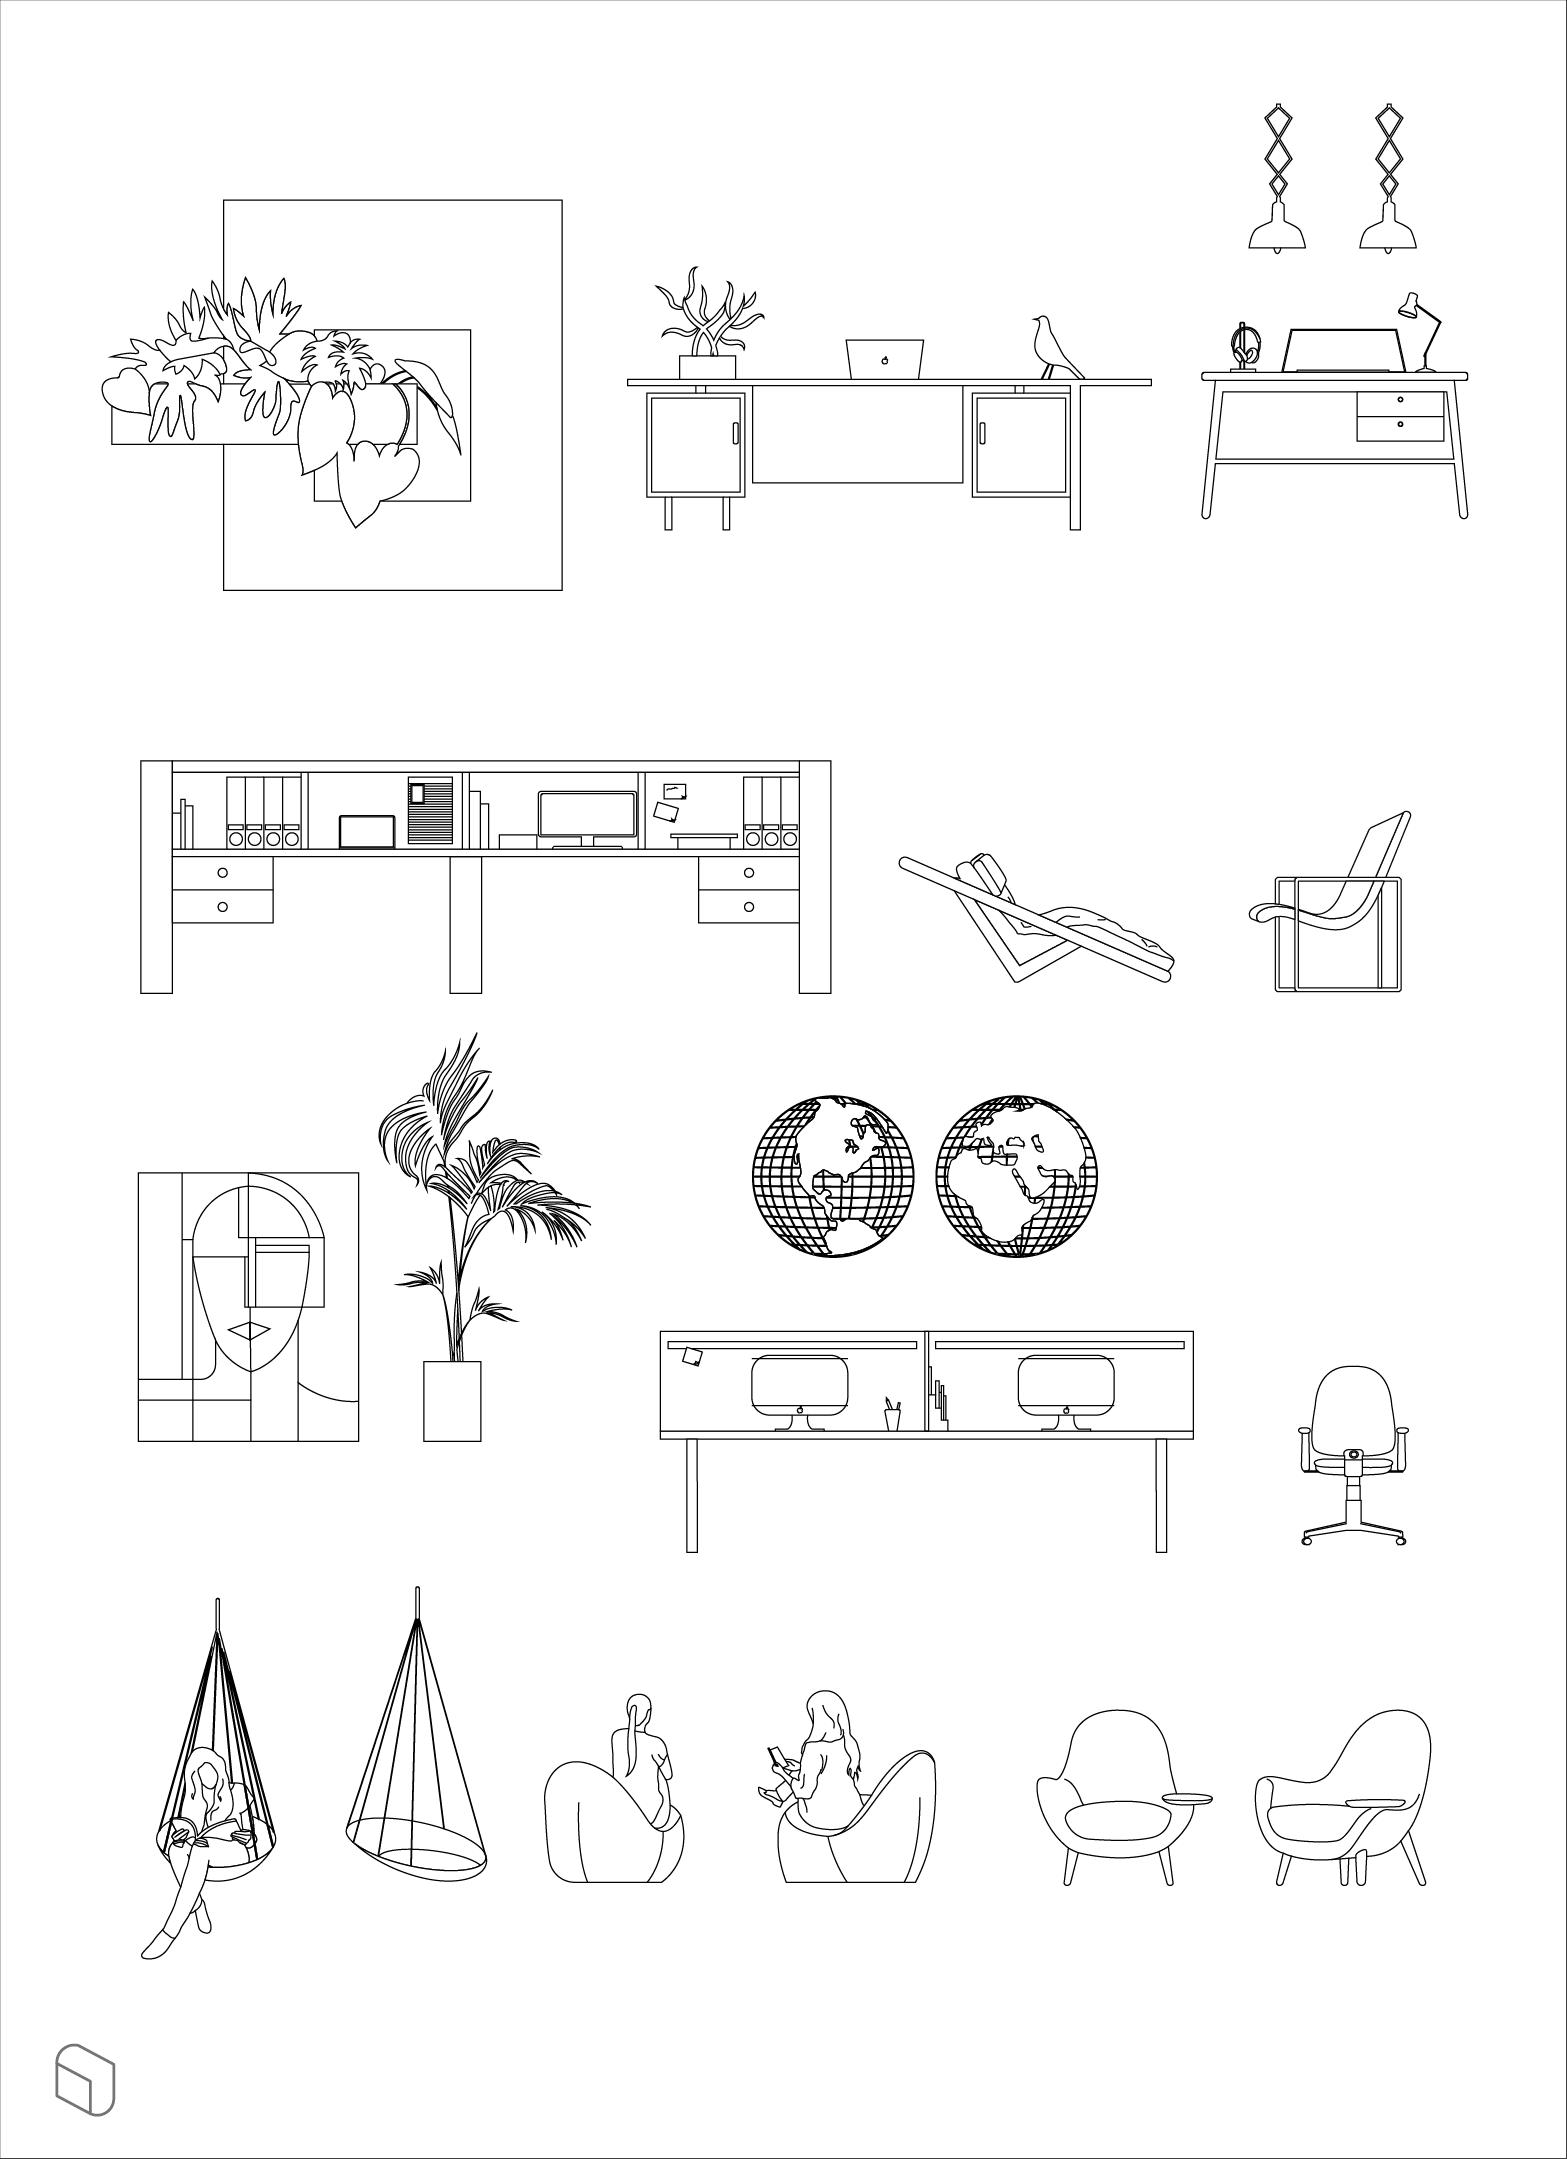 Dwg Contemporary Furnitures Interior Design Renderings Interior Design Drawings Interior Design Sketches